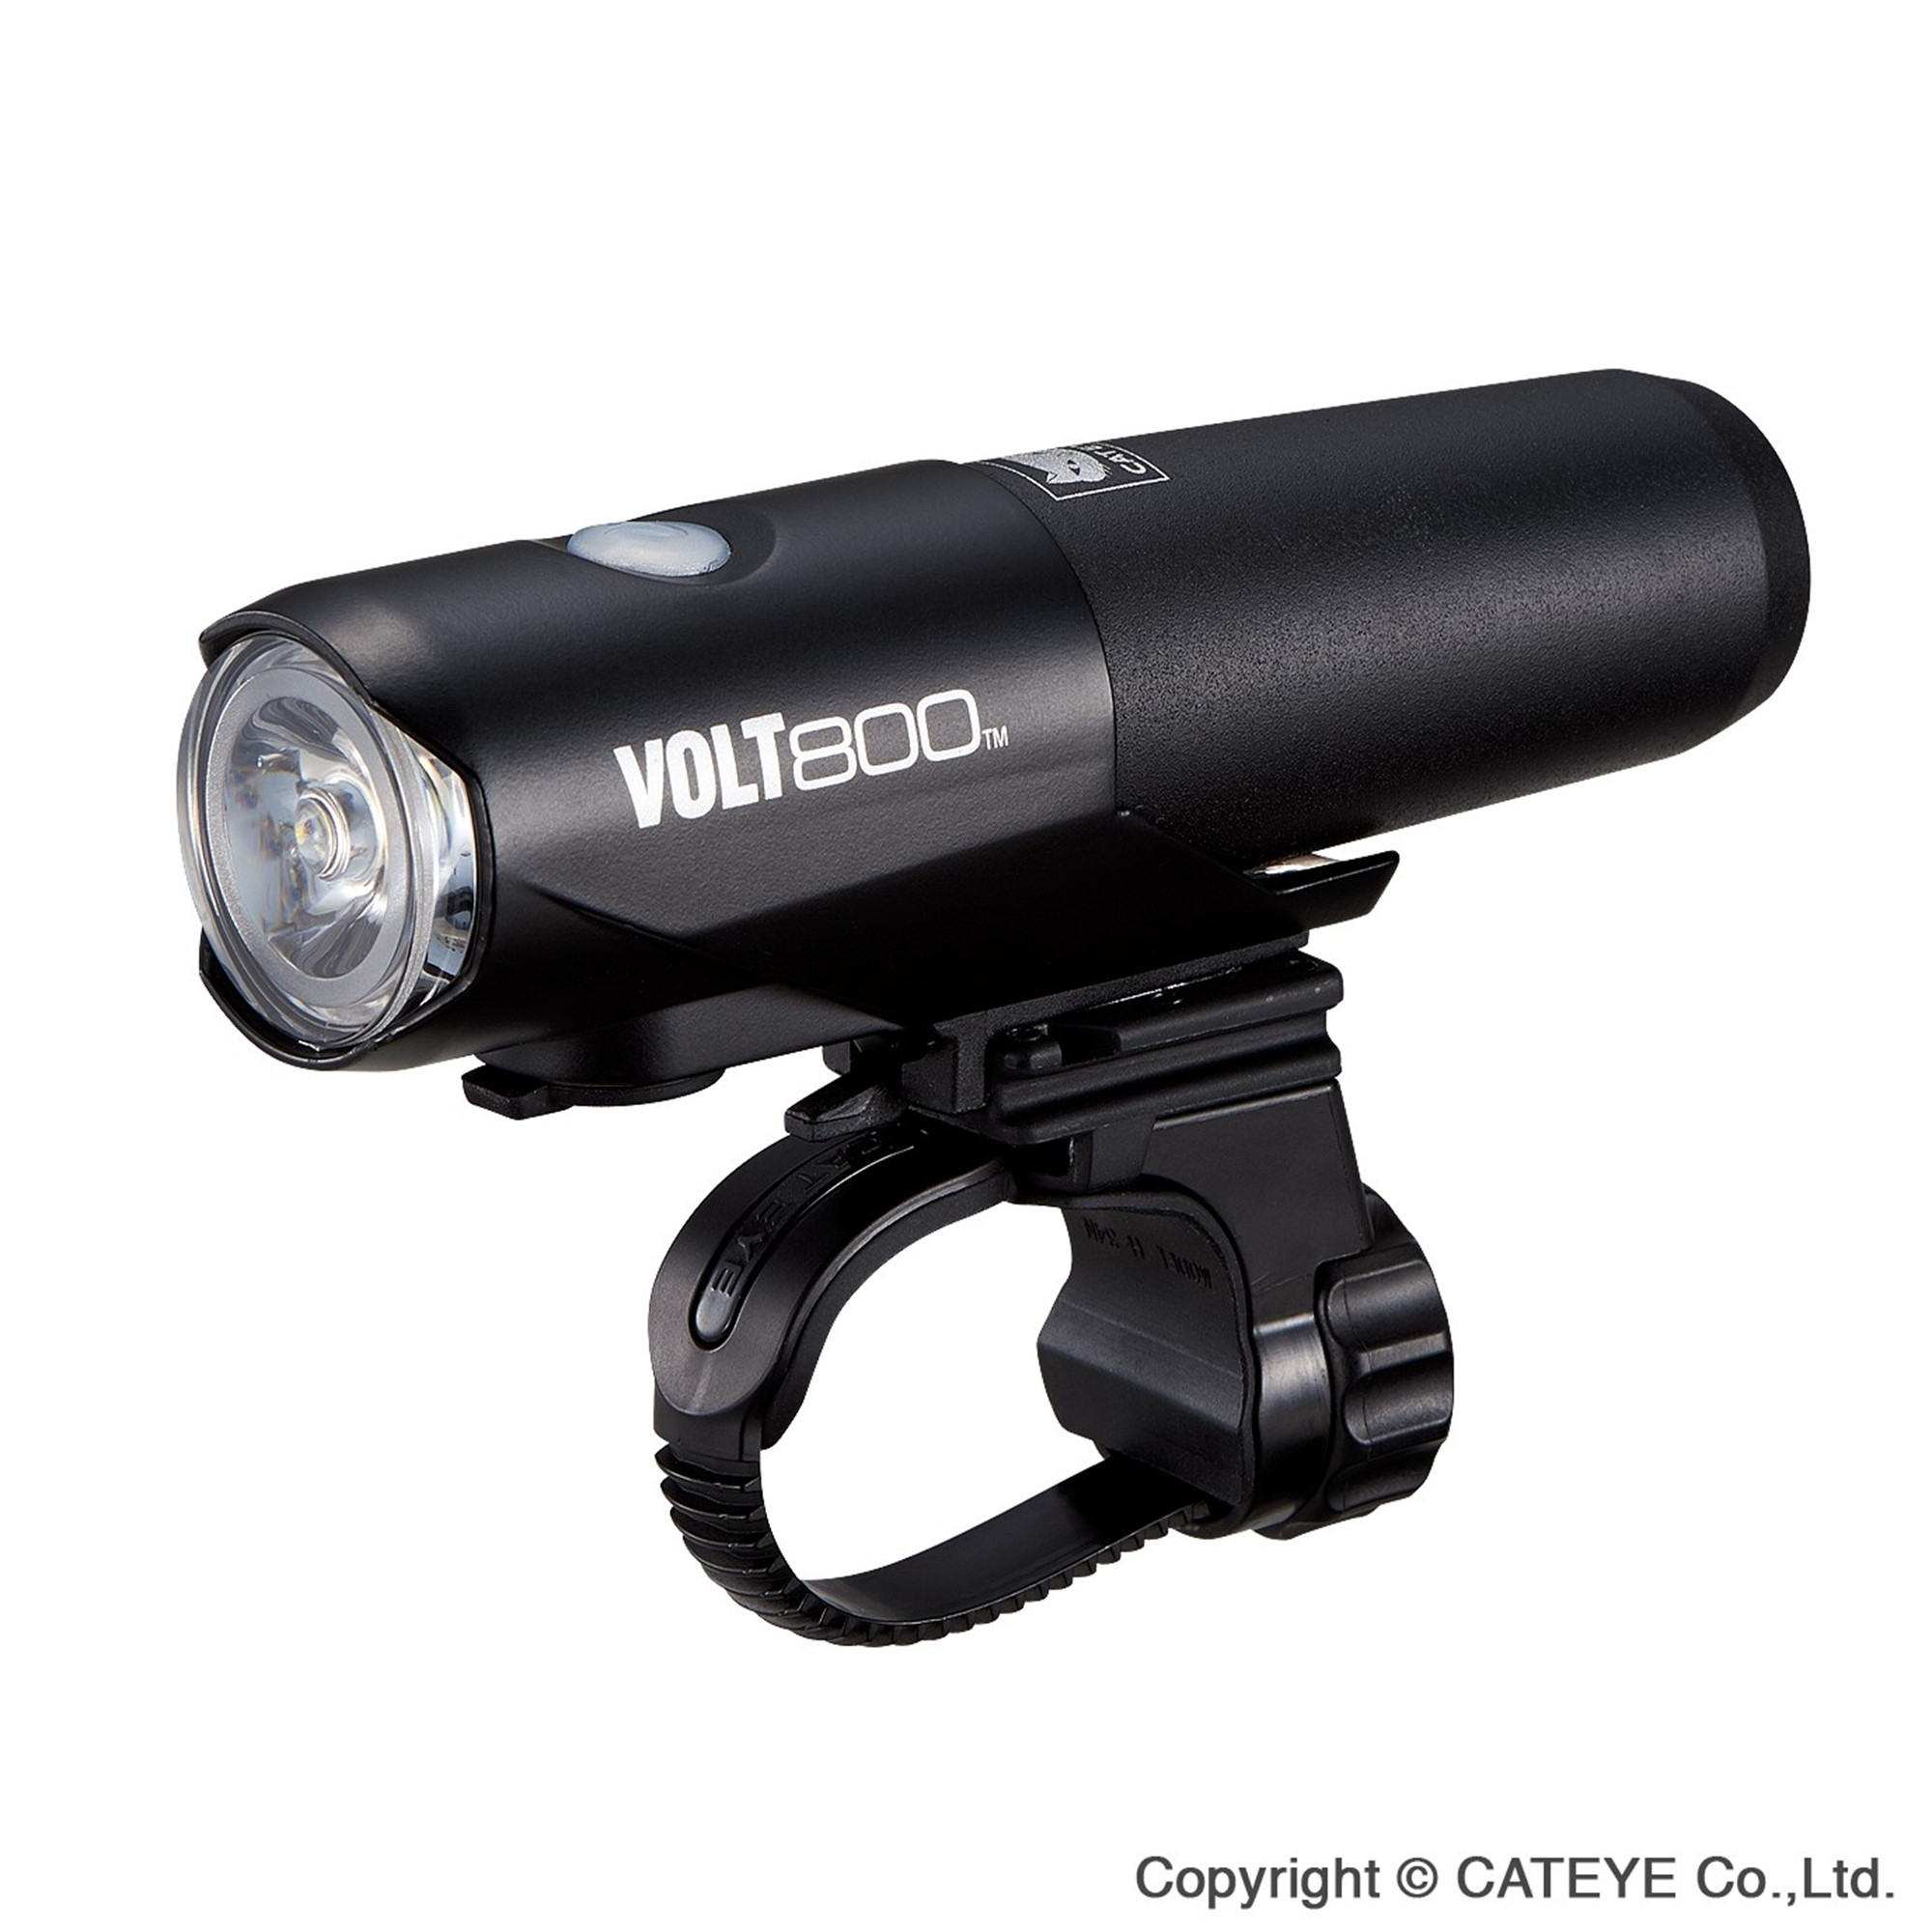 Image of Forlygte Cateye VOLT800XC HL-EL471RC USB Genopladelig - 800 Lumens